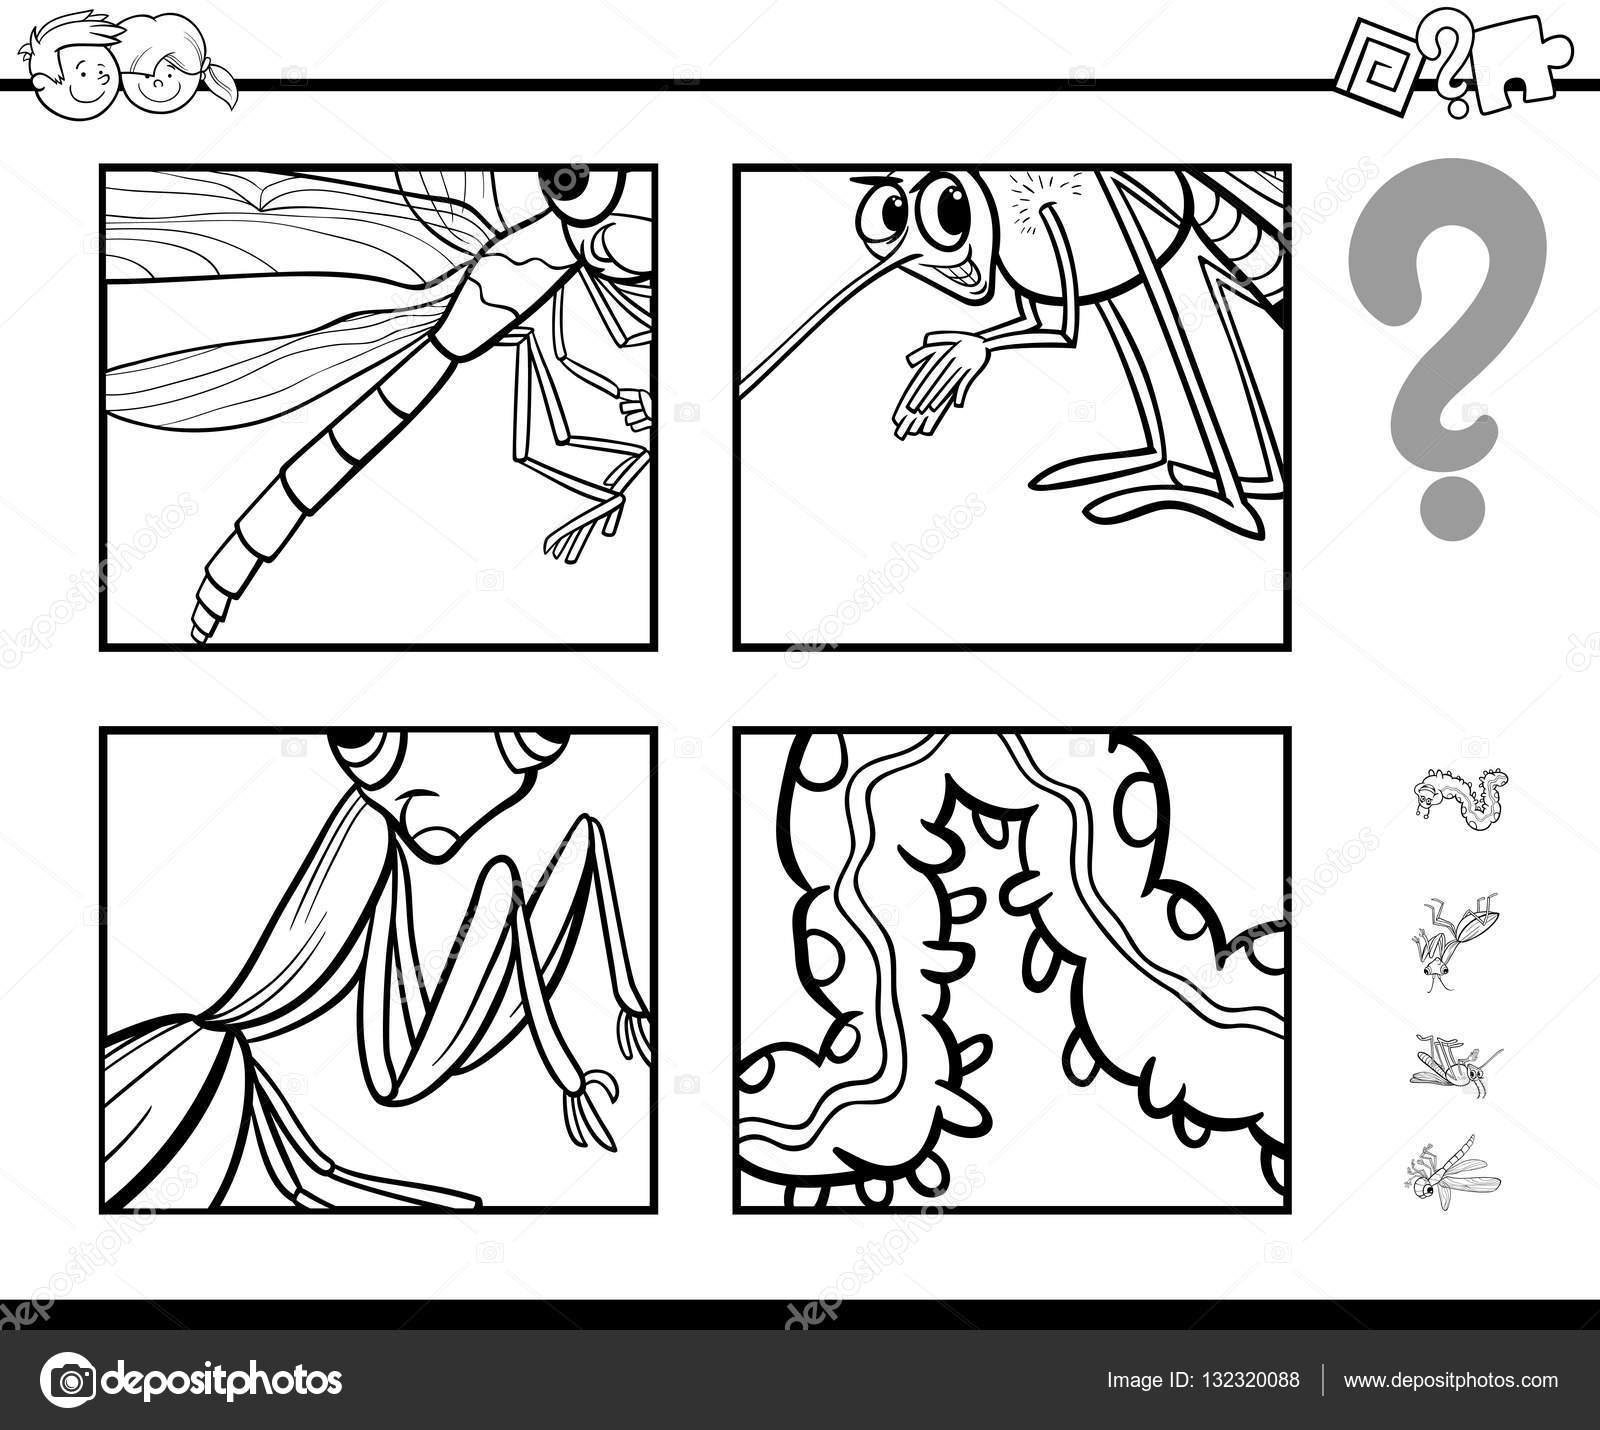 Vermutung Insekten Malvorlagen — Stockvektor © izakowski #132320088